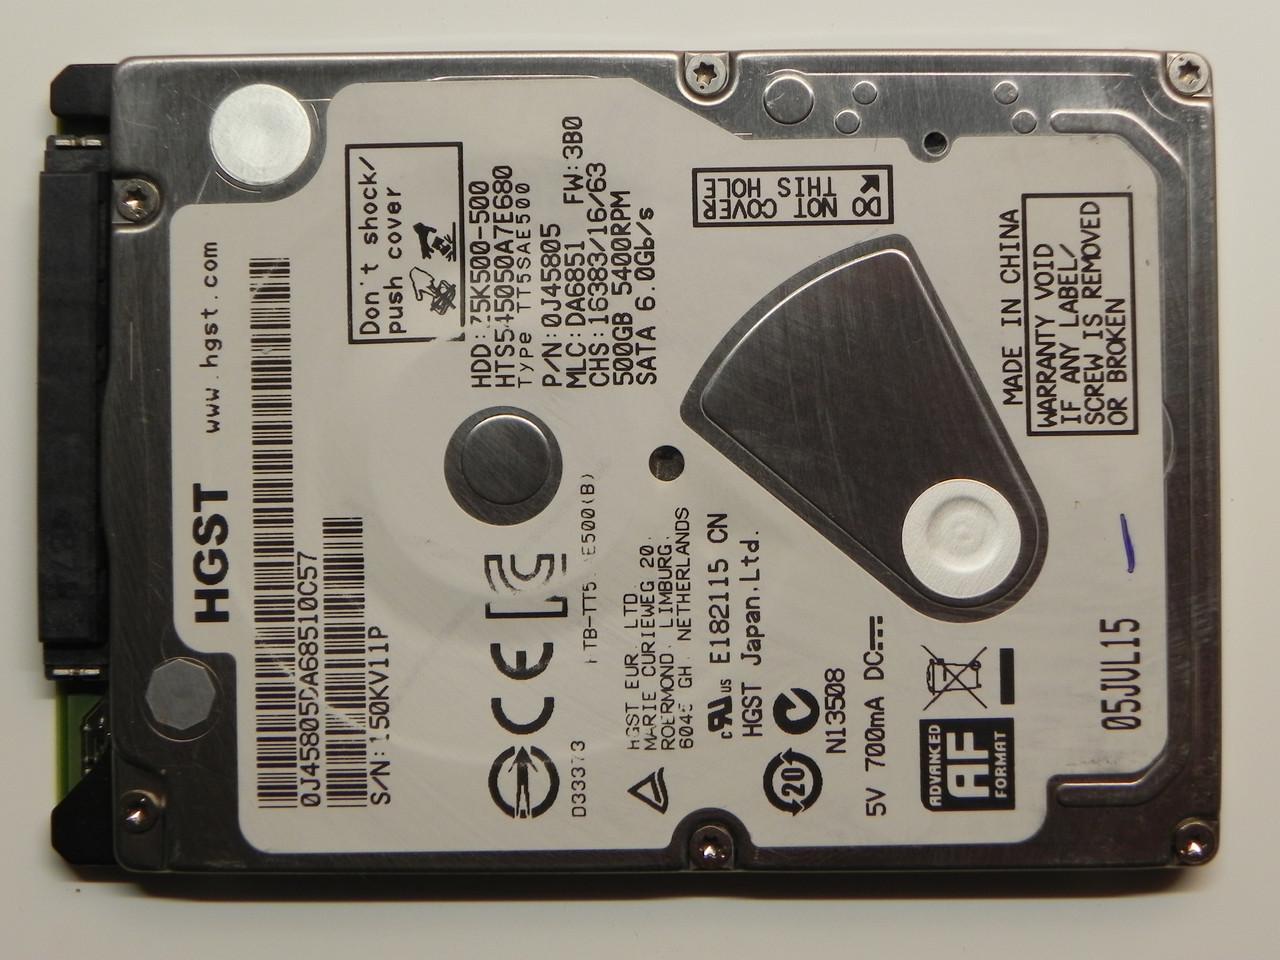 HDD Жесткий диск 500GB Hitachi (HGST) Travelstar Z5K500 БУ Есть дефект